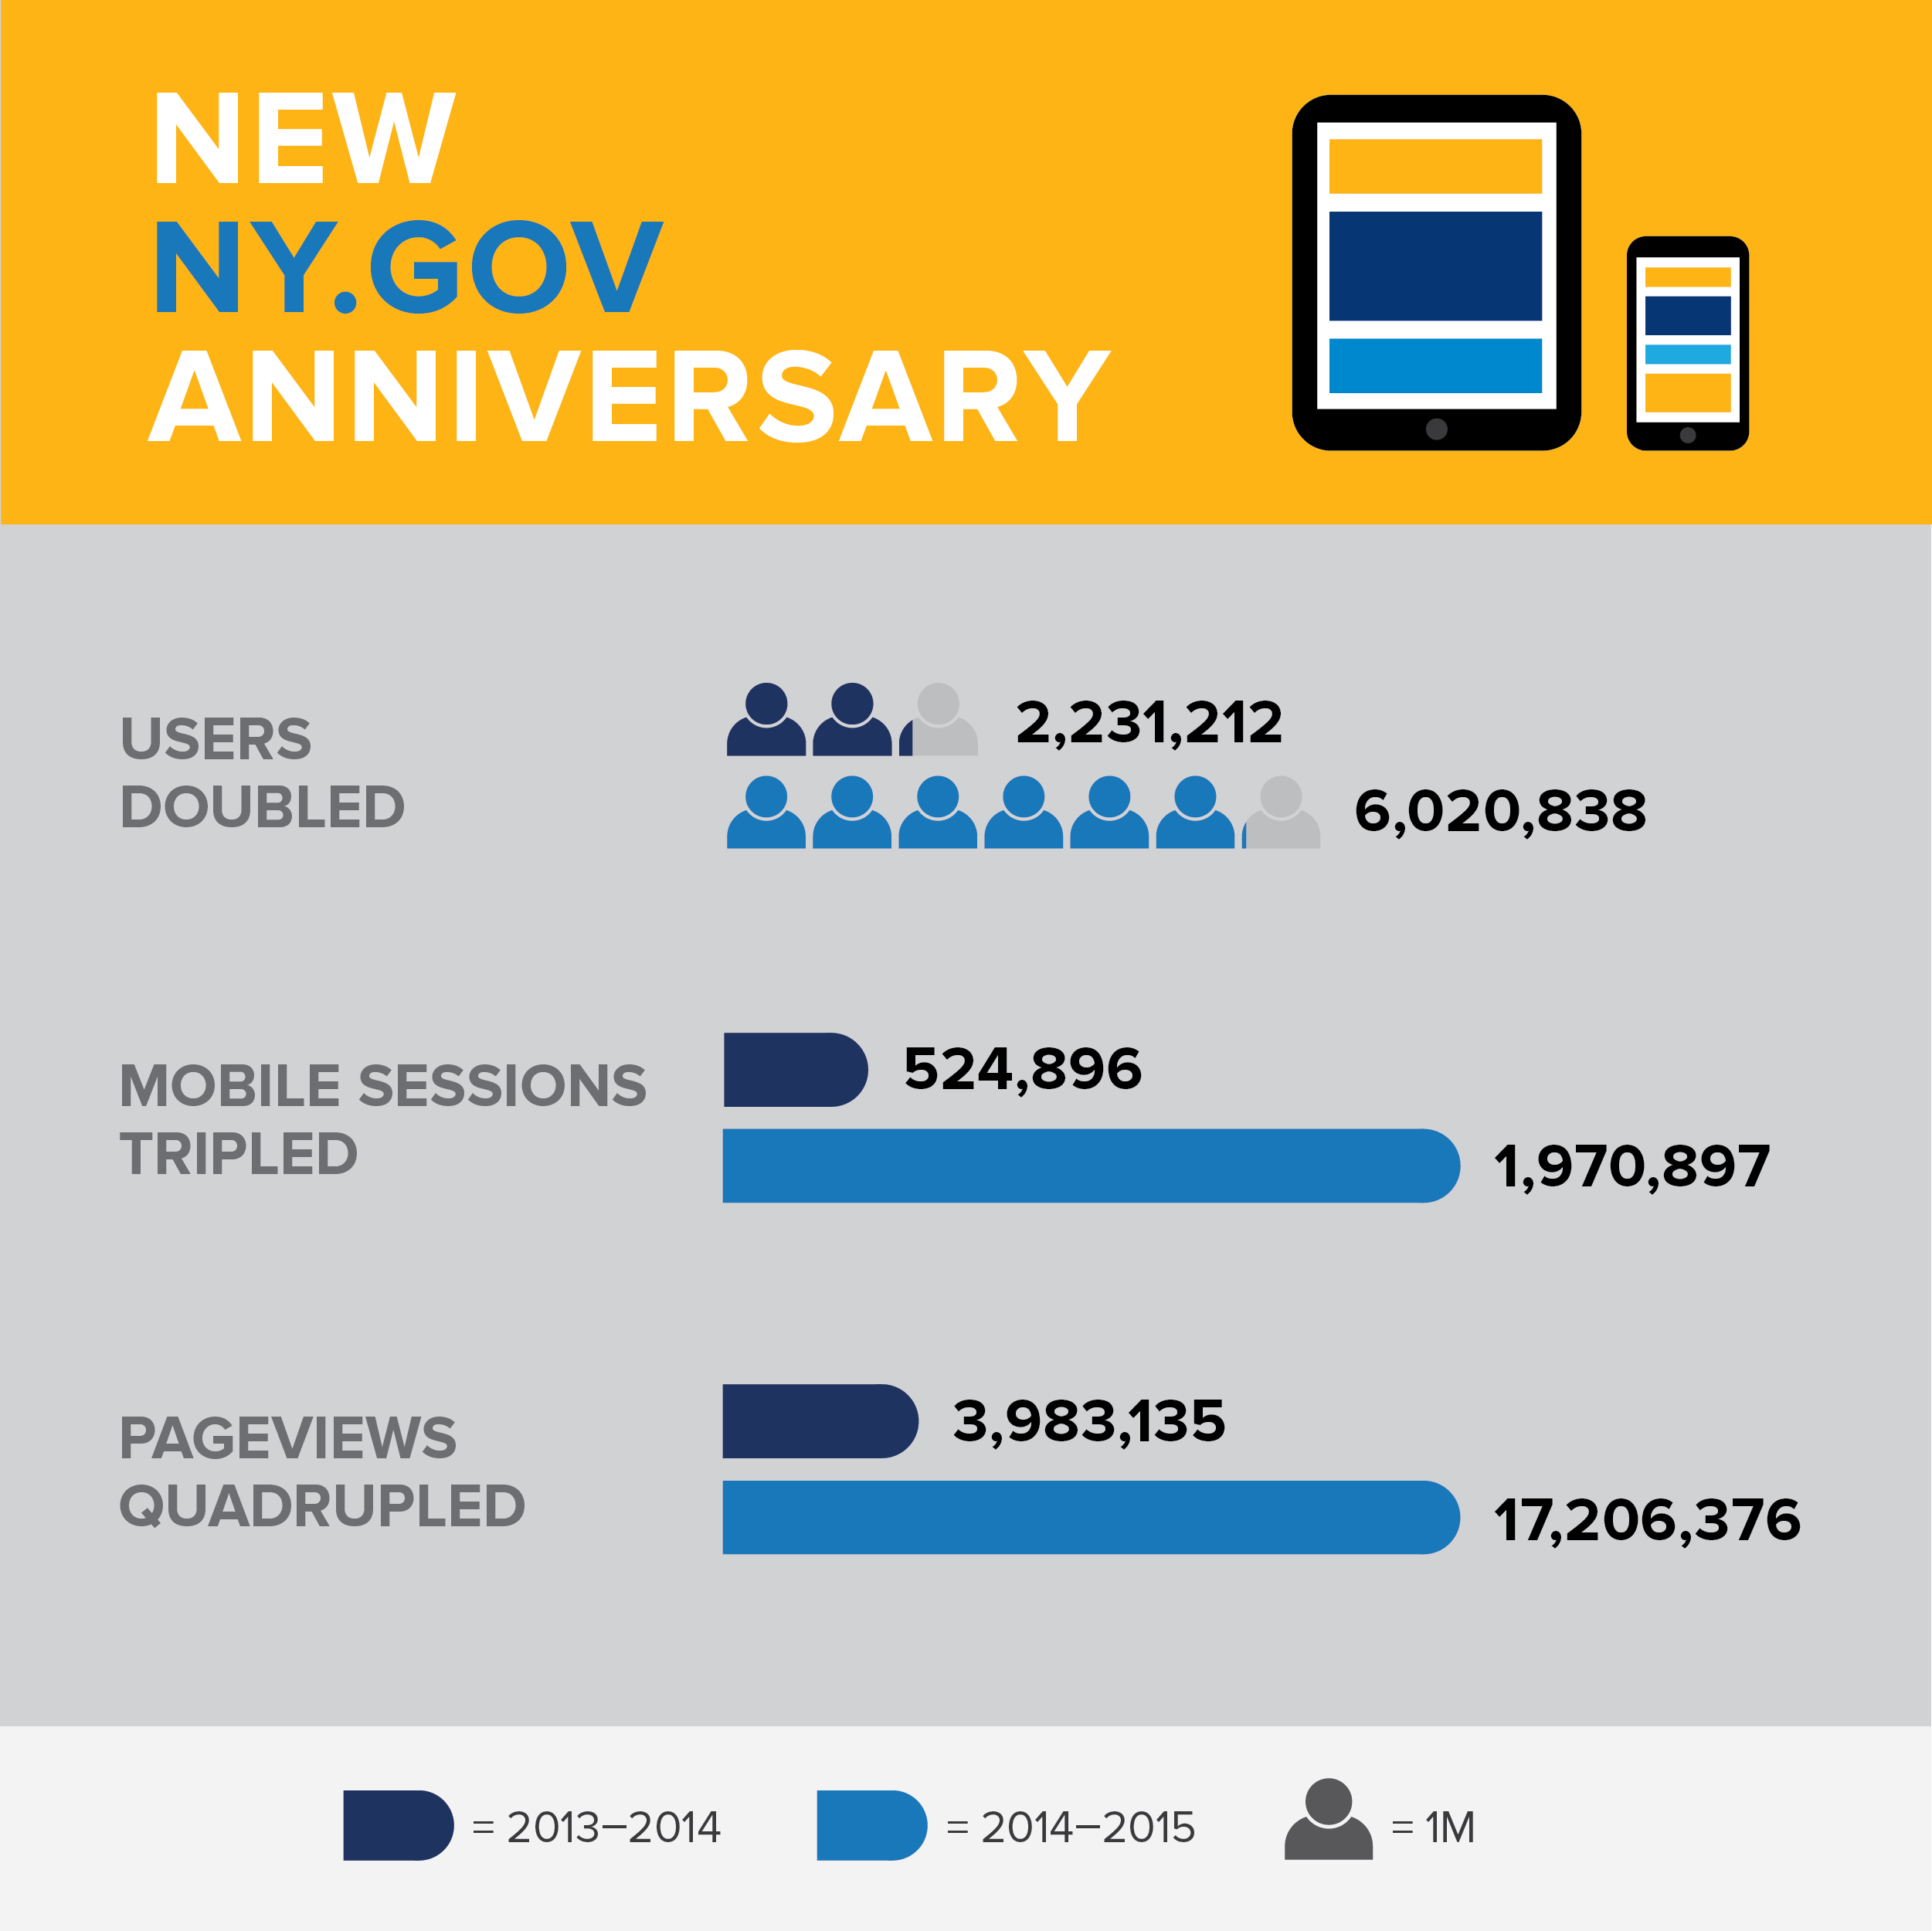 NY.gov_Anniversary_Infographic